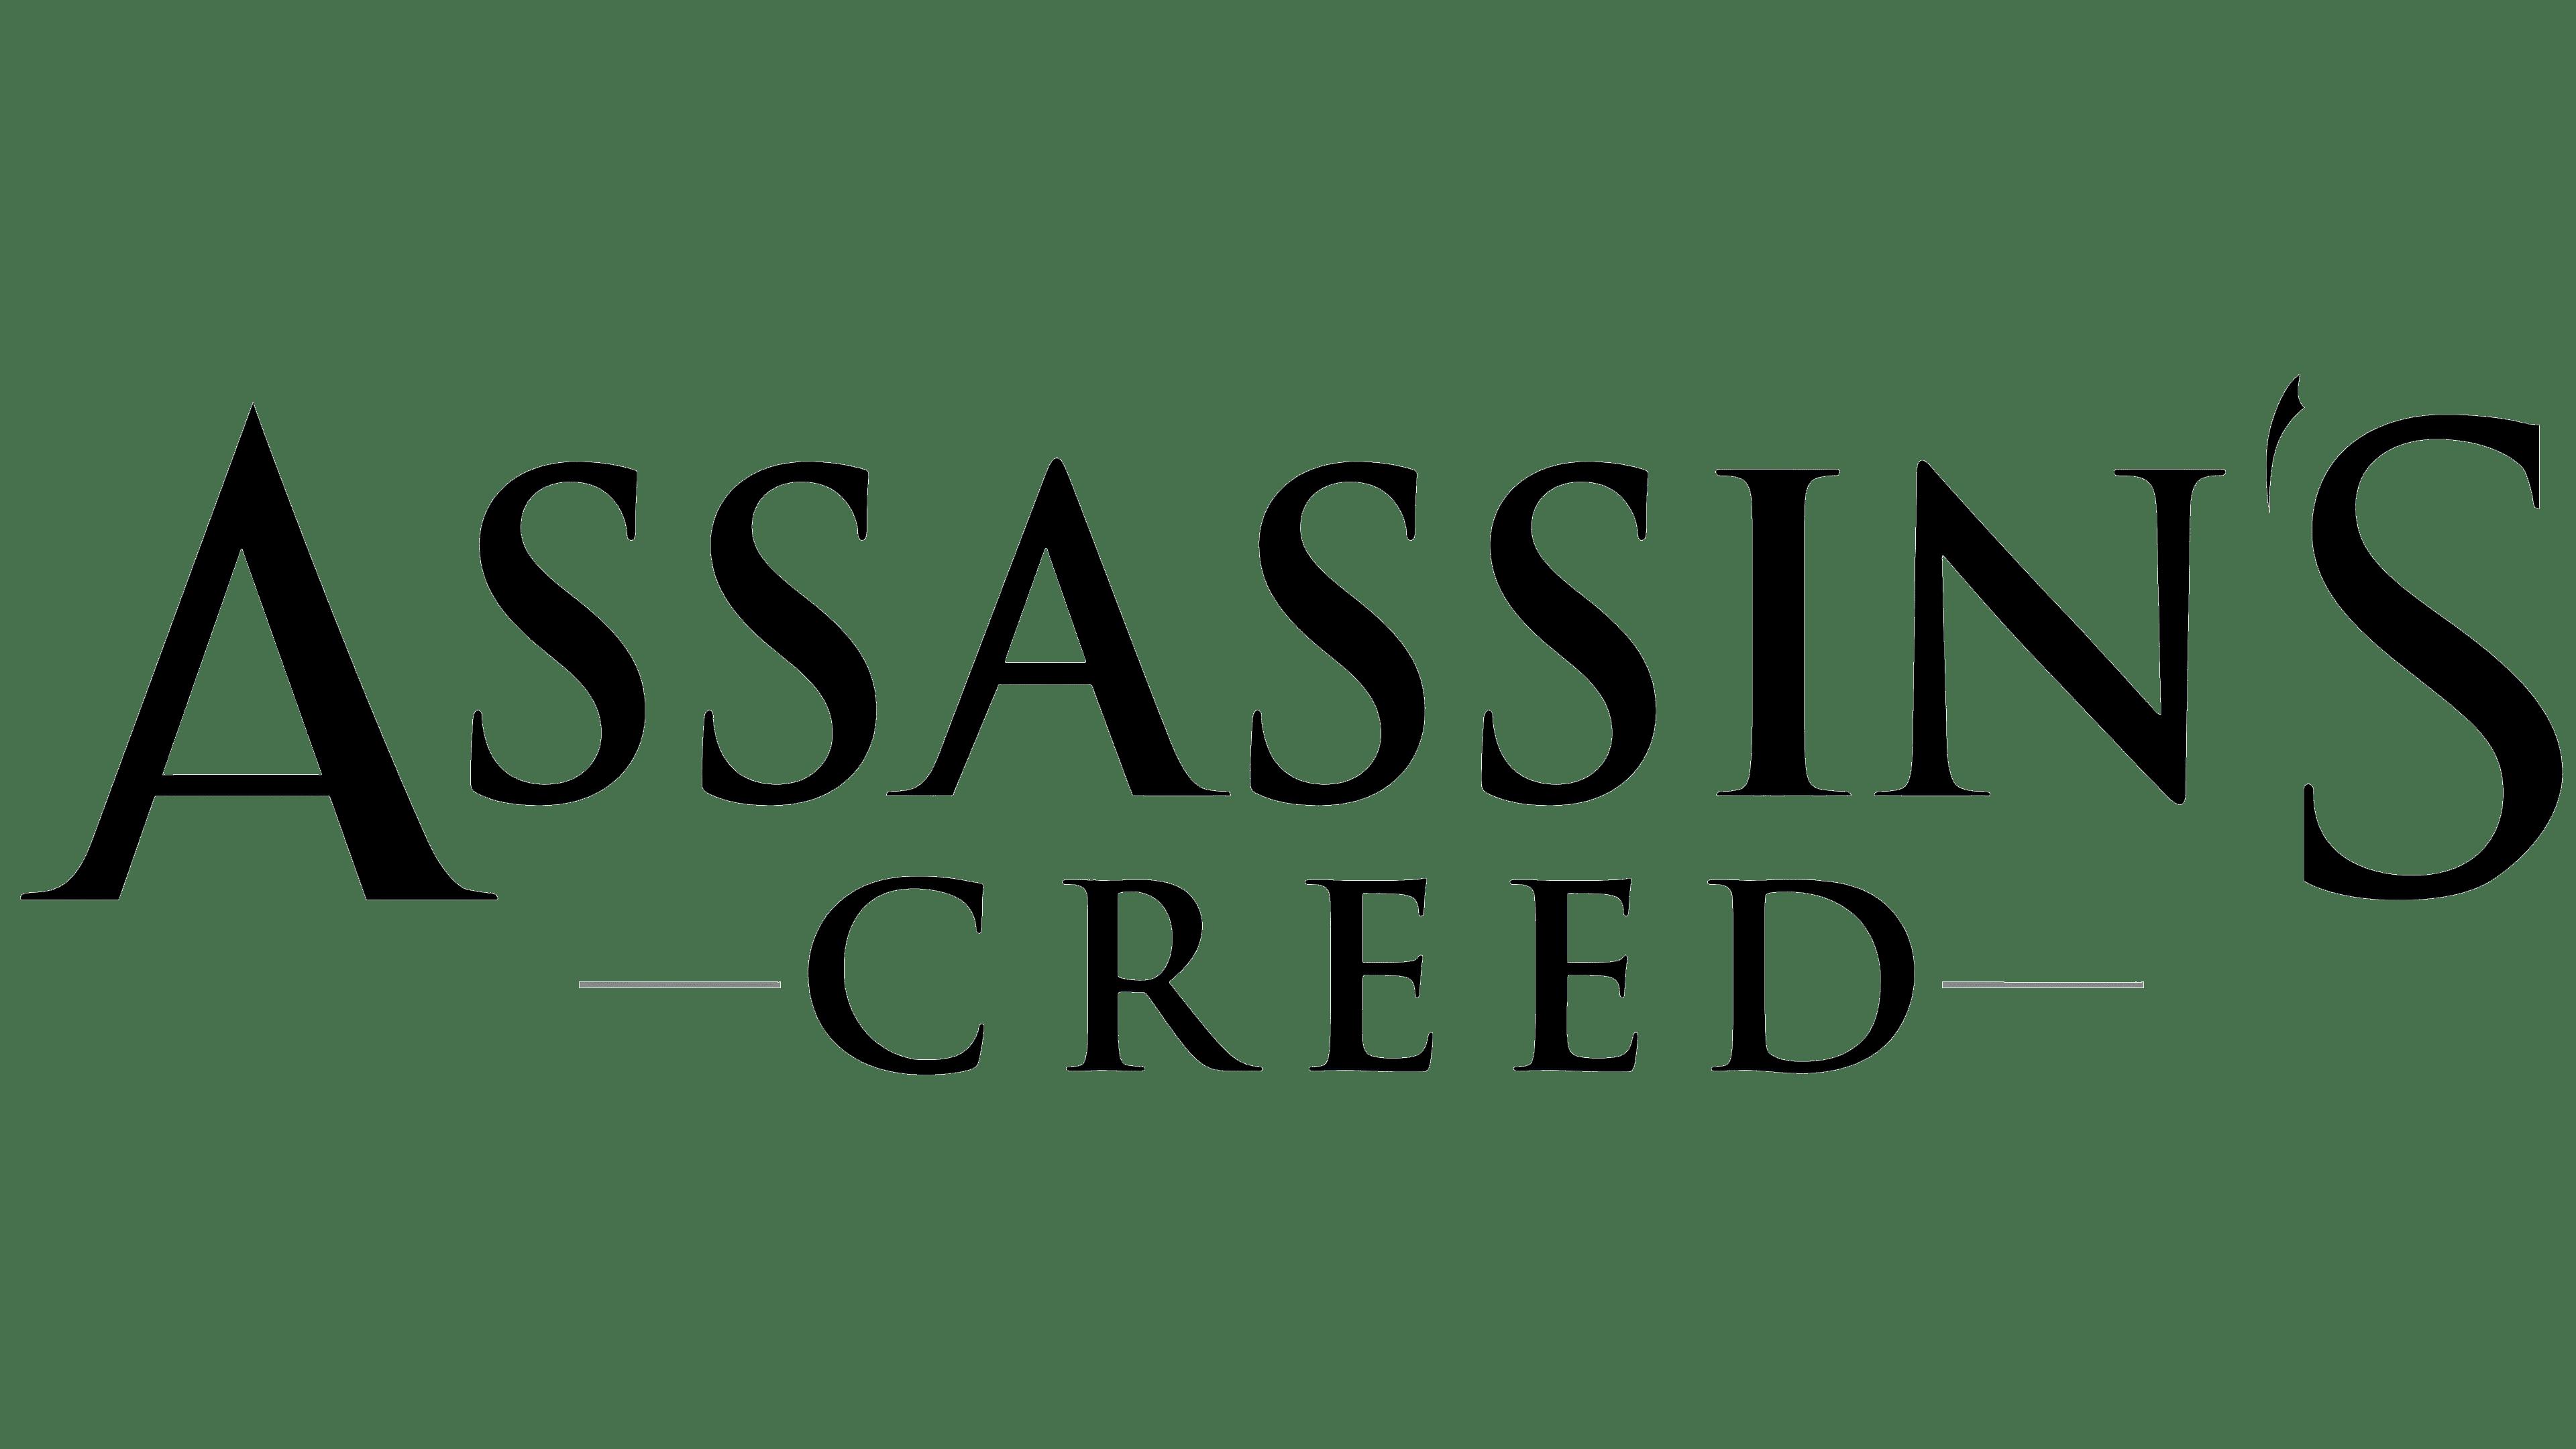 transparent background red assassins creed logo